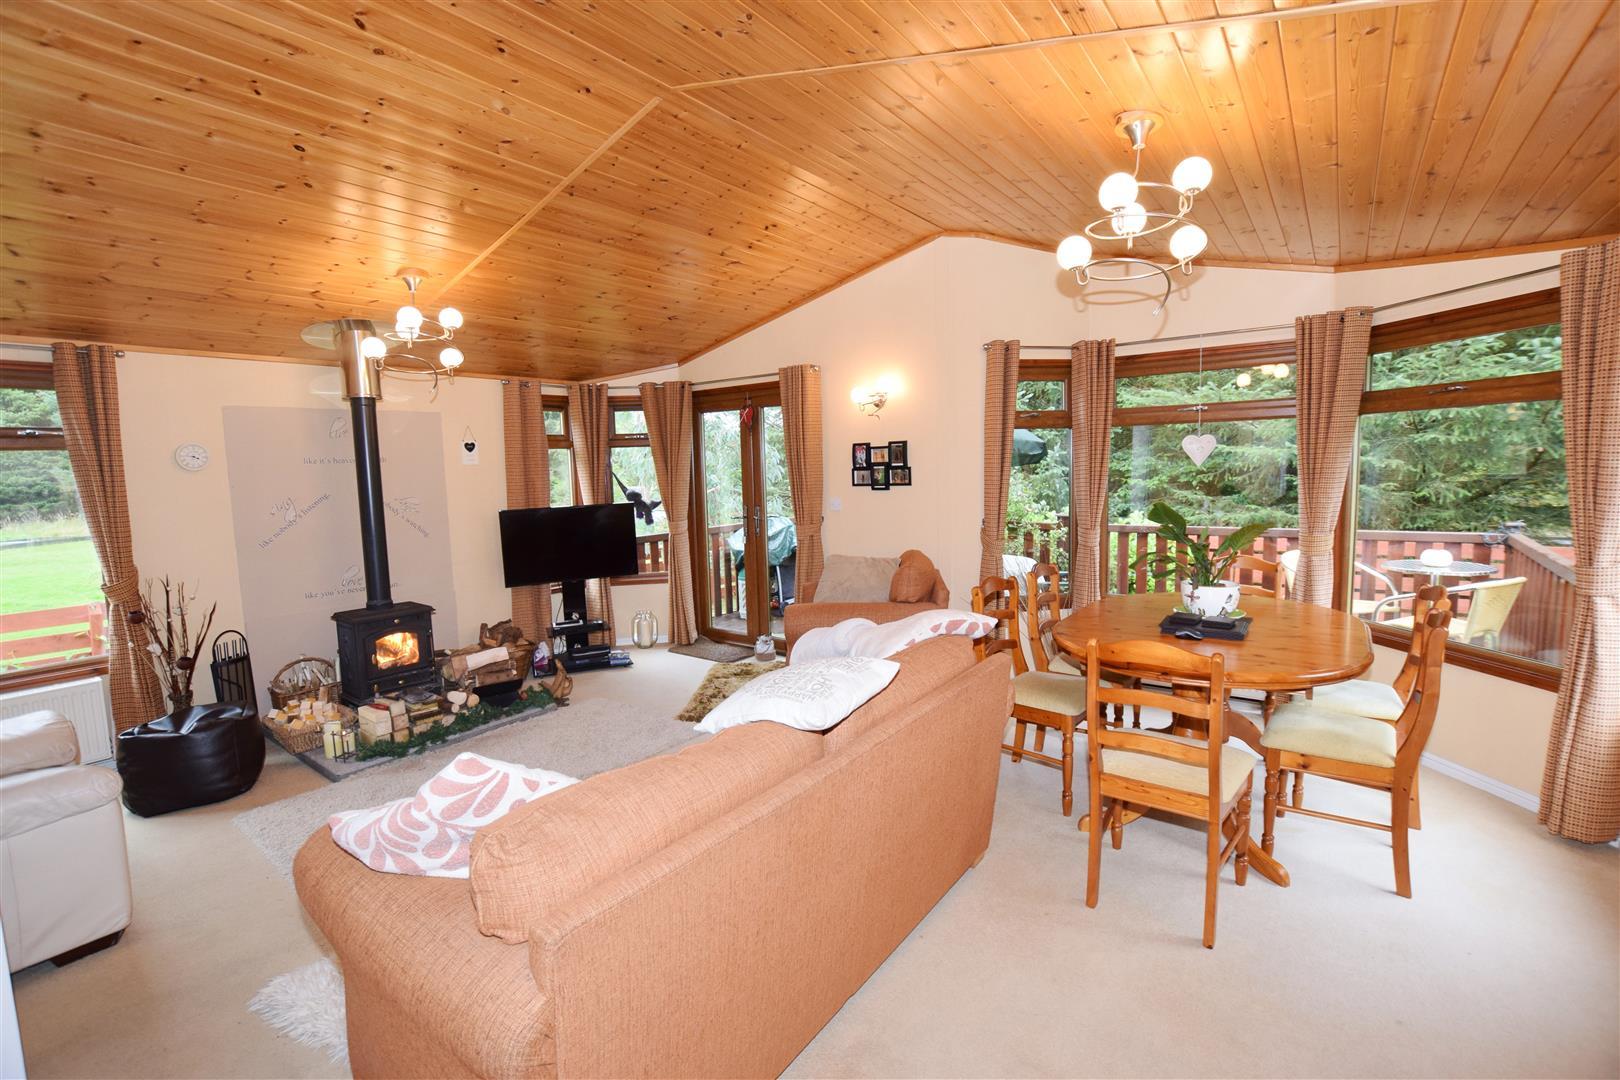 Riverlea Lodge, Glendevon Park, Glendevon, Dollar, Perthshire, FK14 7JY, UK